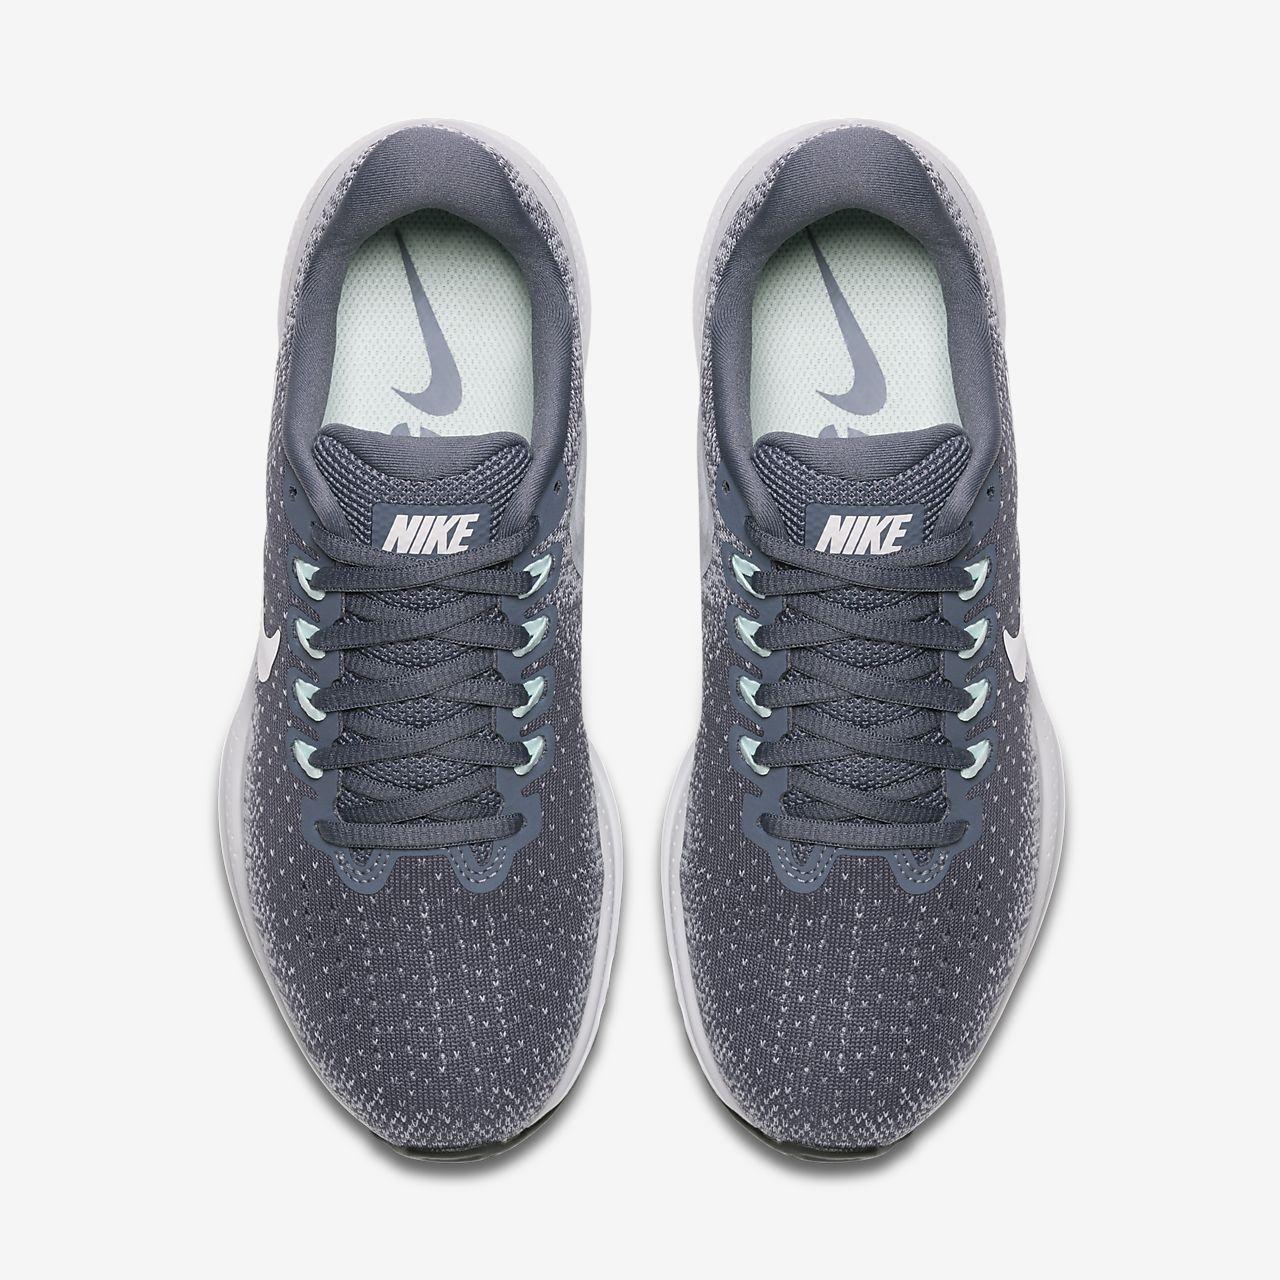 be0392d44175 Nike Air Zoom Vomero 13 Women s Running Shoe. Nike.com CA